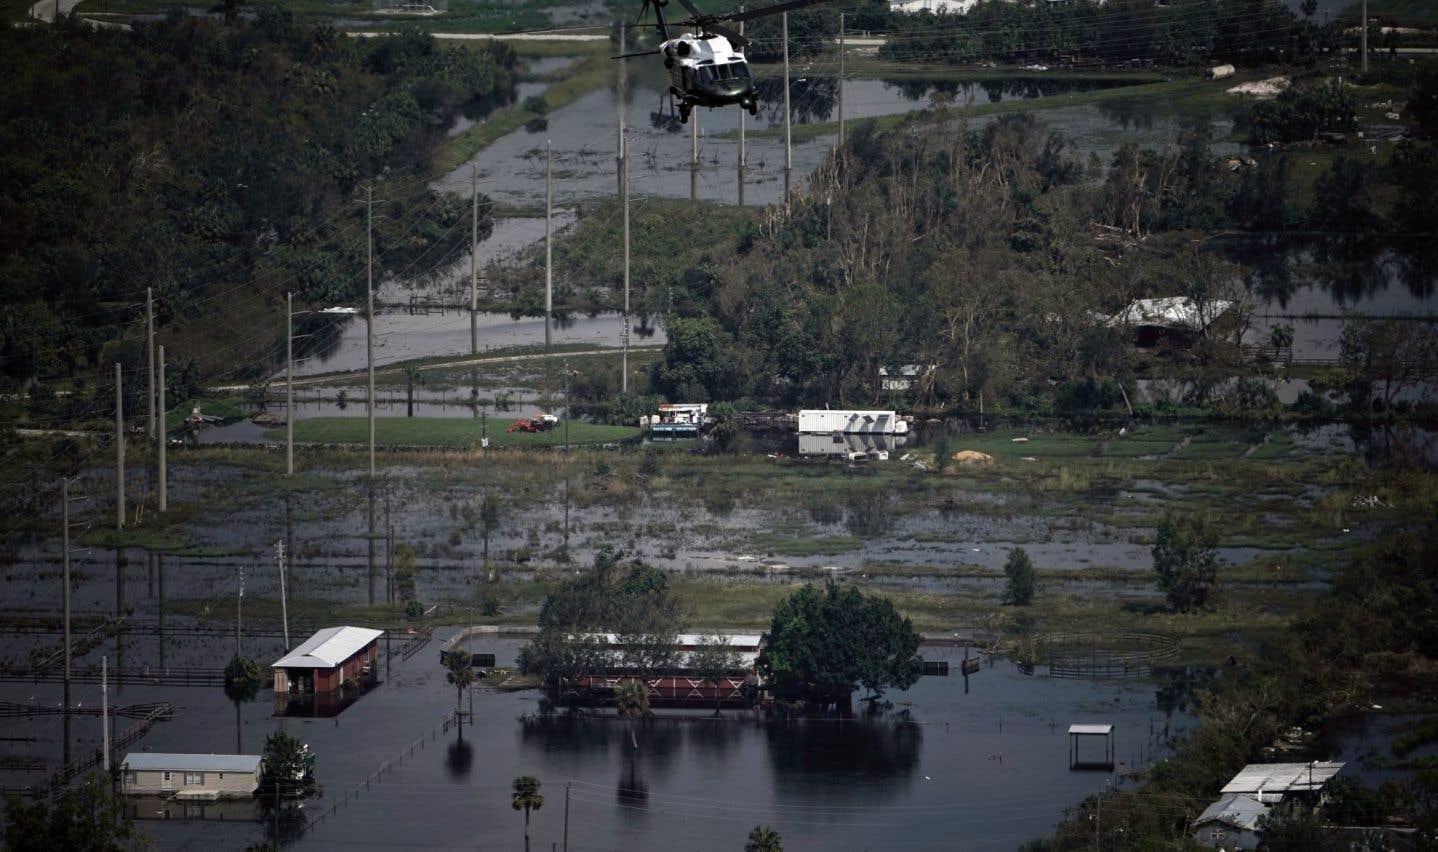 Donald Trump en Floride après «Irma»